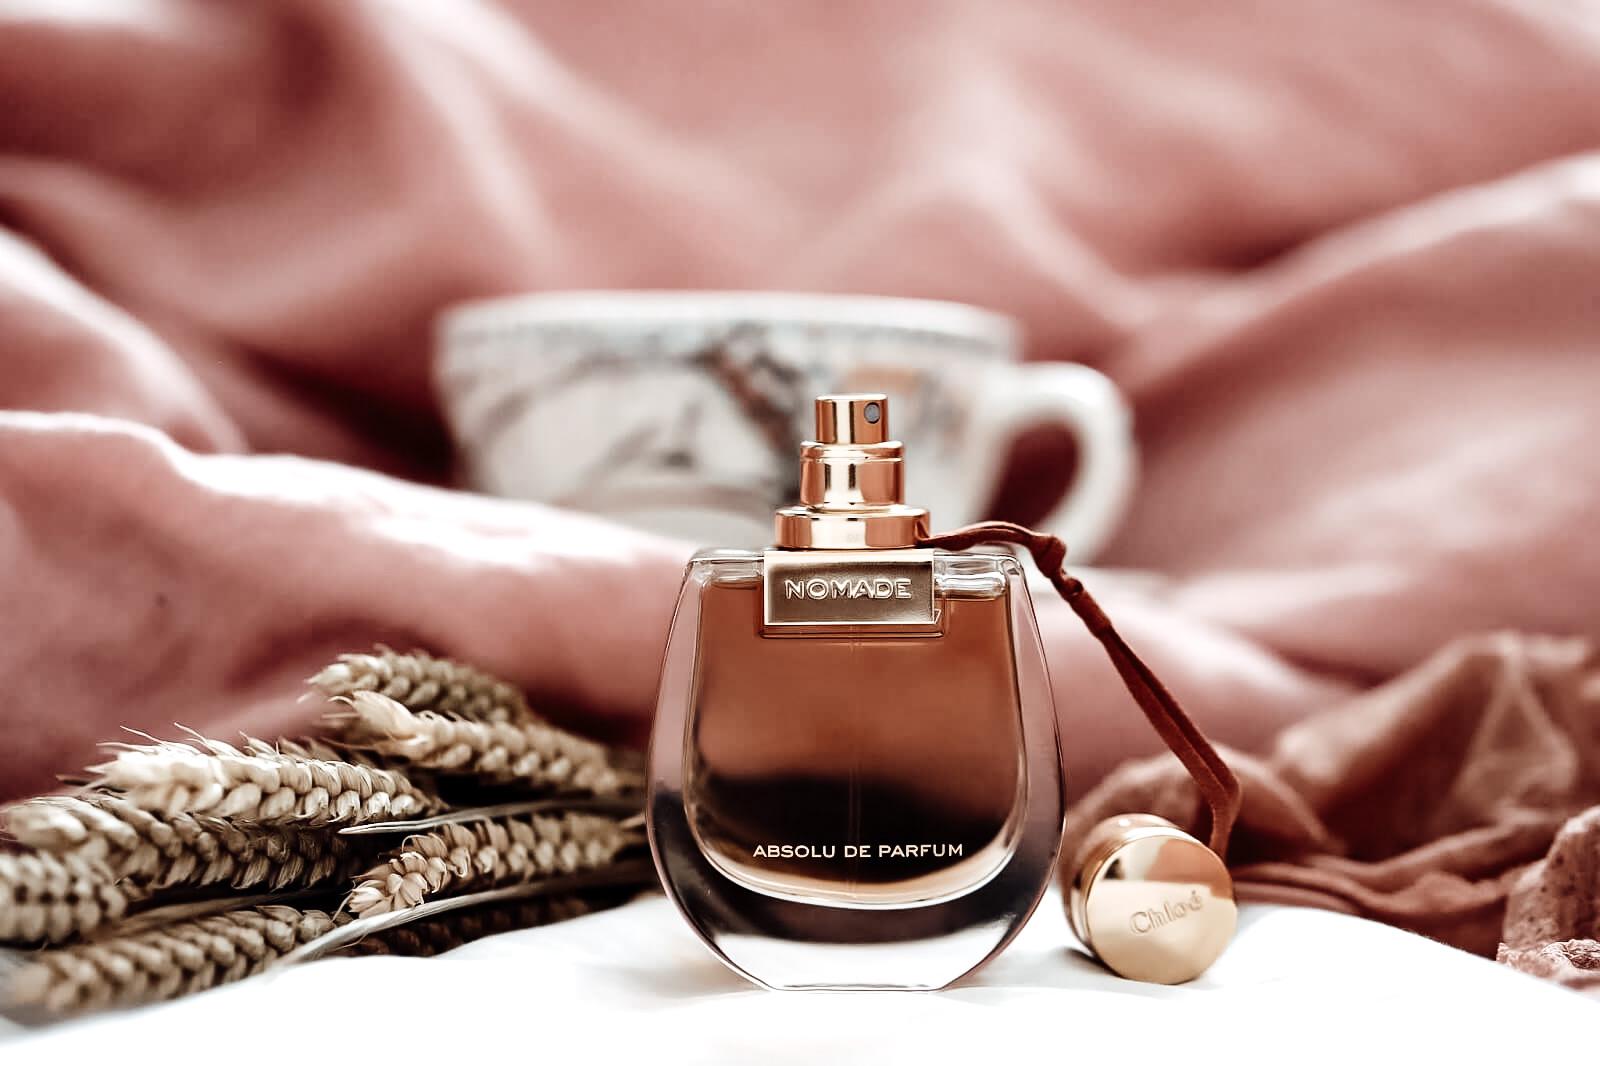 chloé nomade absolu de parfum test